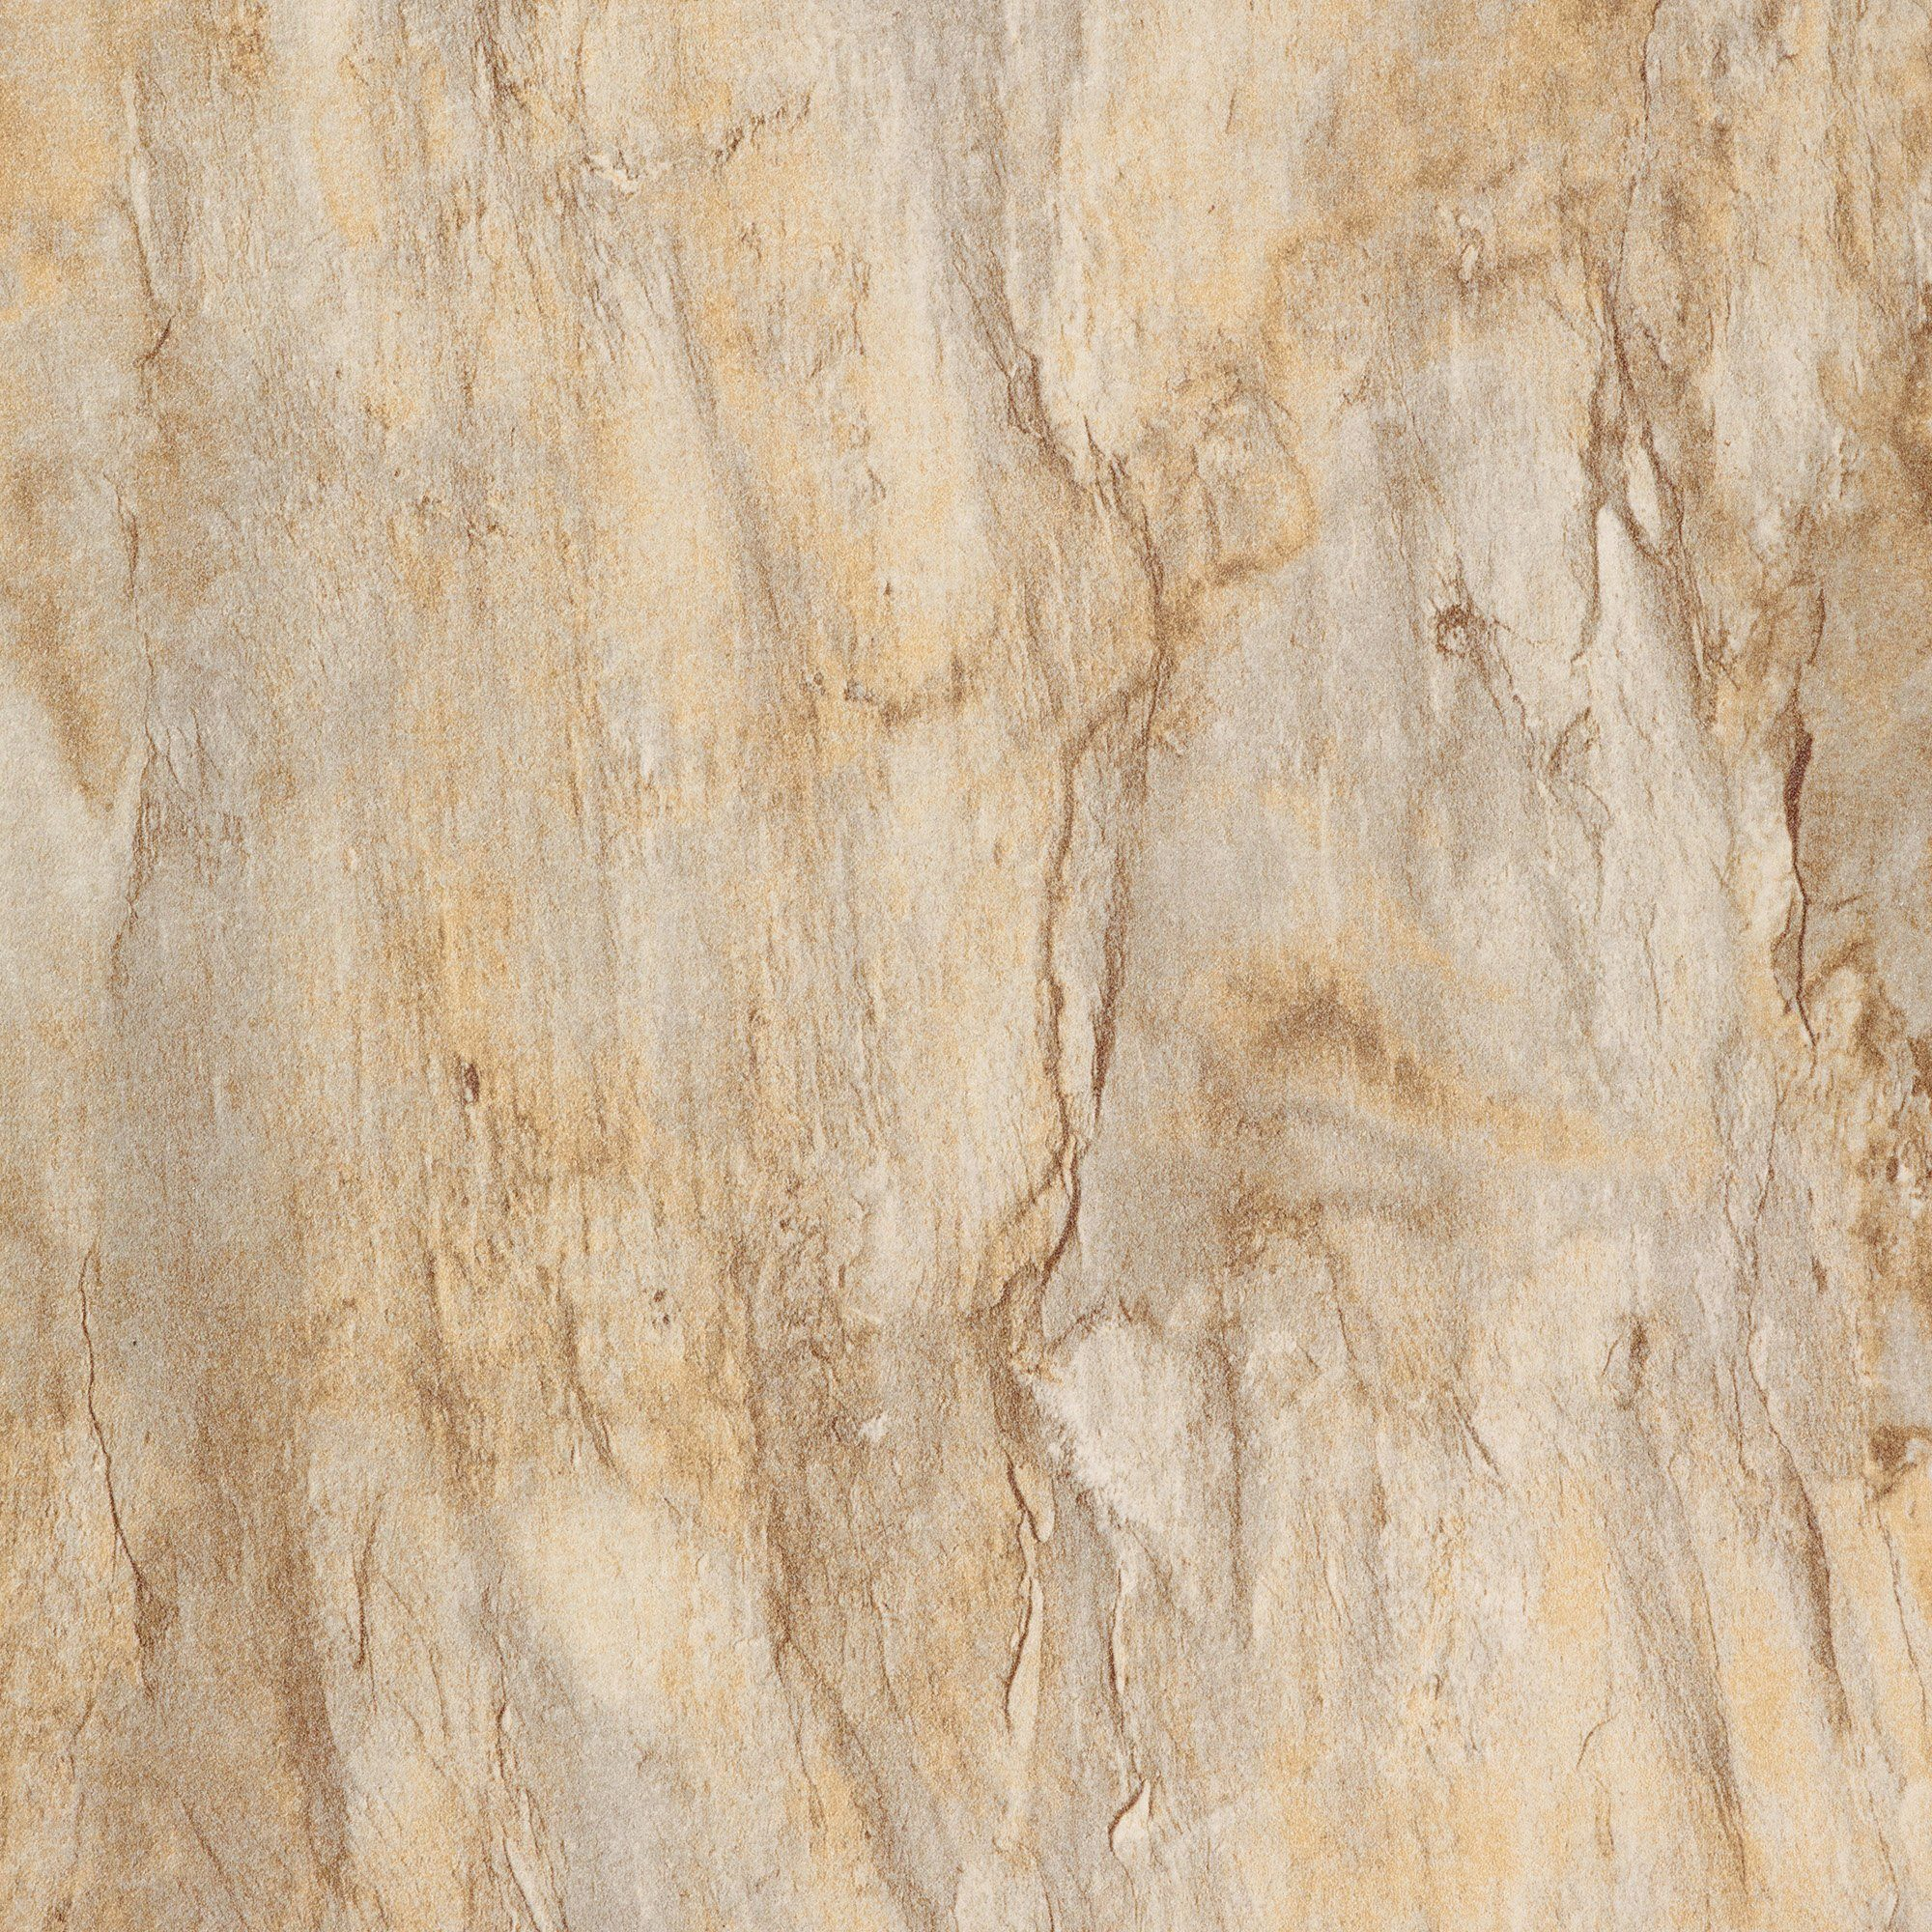 BODENMEISTER Packung: Laminat »Fliesenoptik Schiefer hell«, 60 x 30 cm Fliese, Stärke: 8 mm